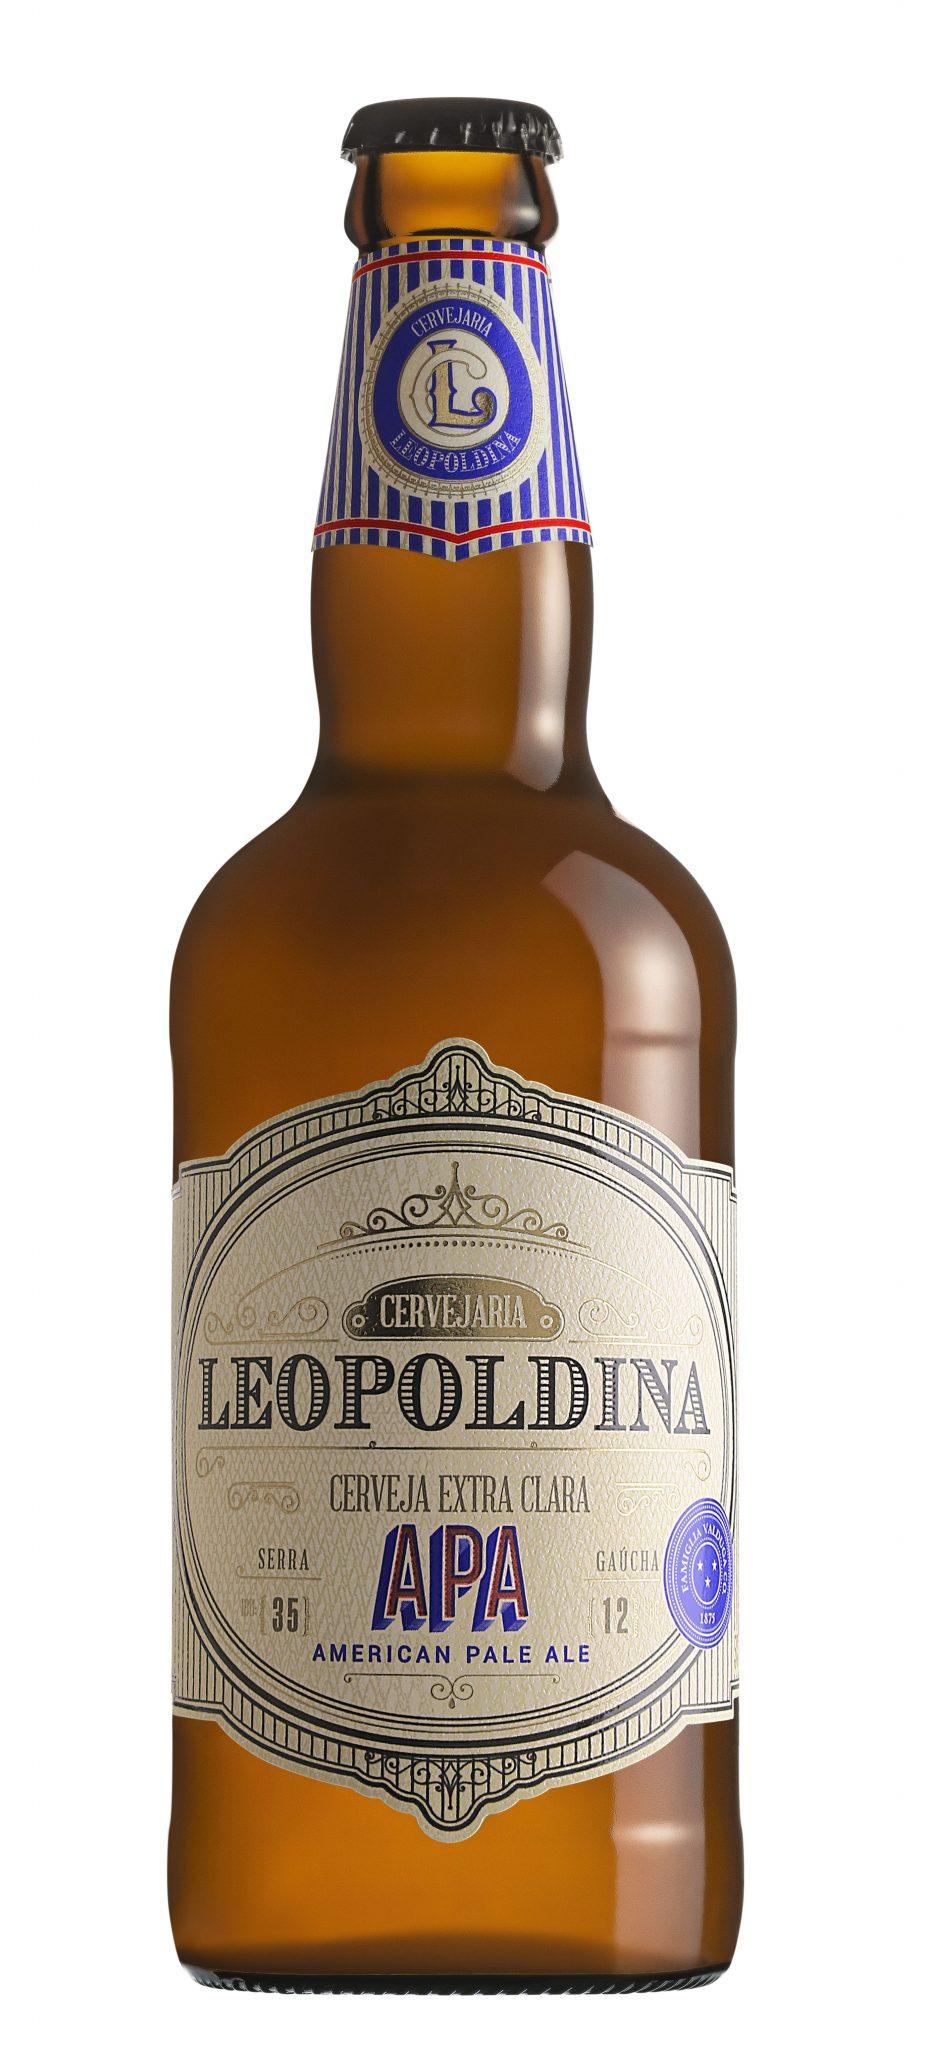 Leopoldina APA